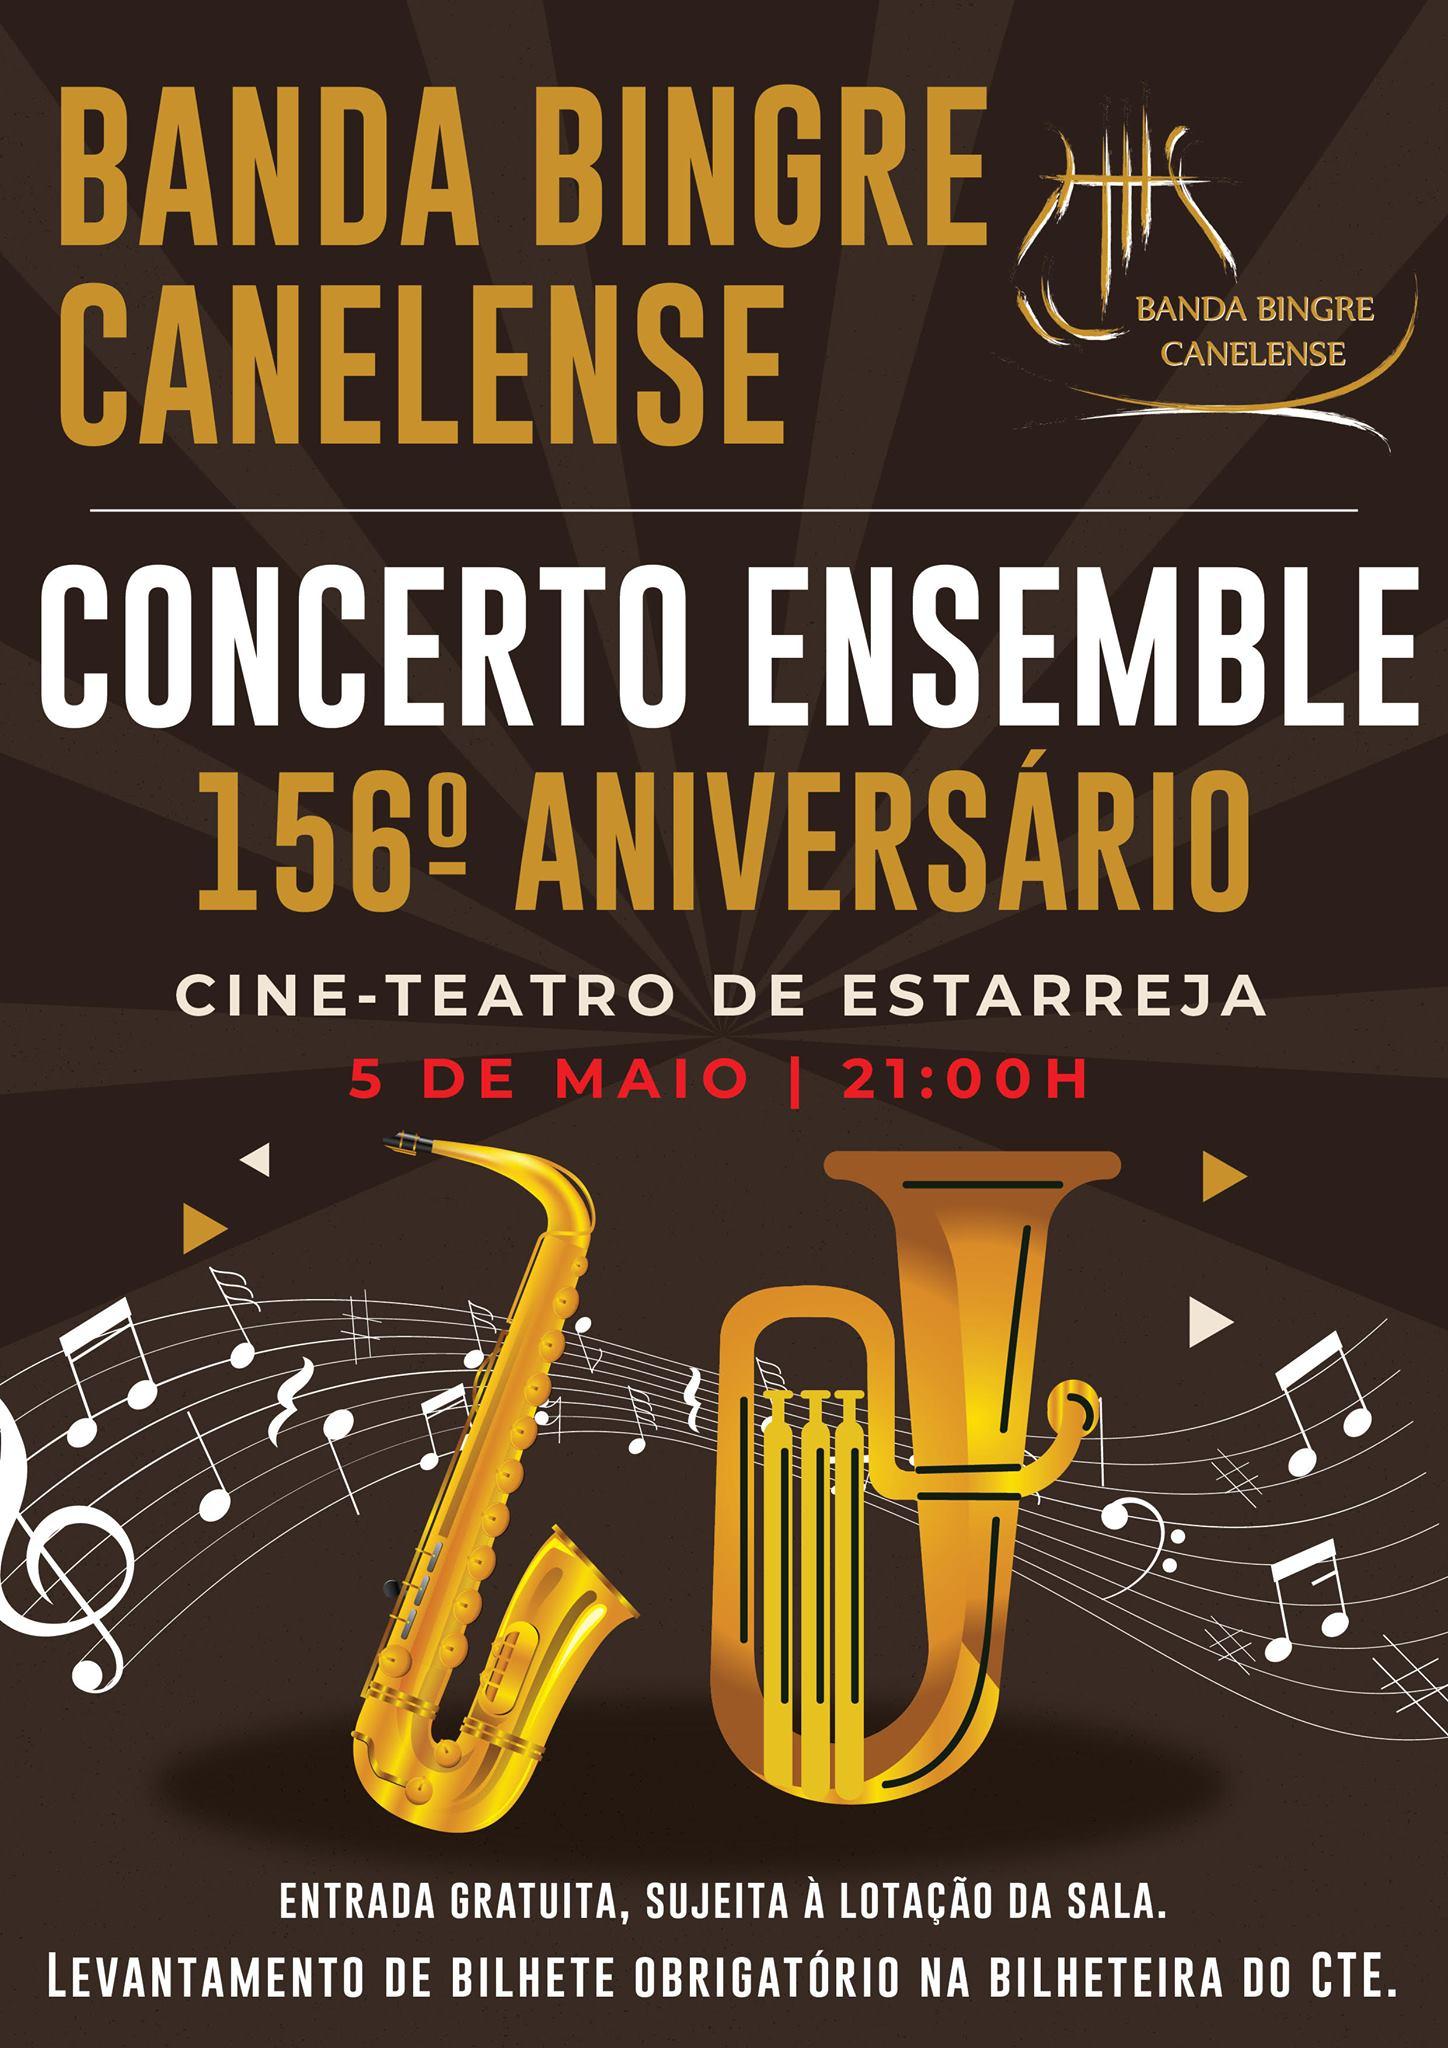 BANDA BINGRE CANELENSE | 156.º ANIVERSÁRIO